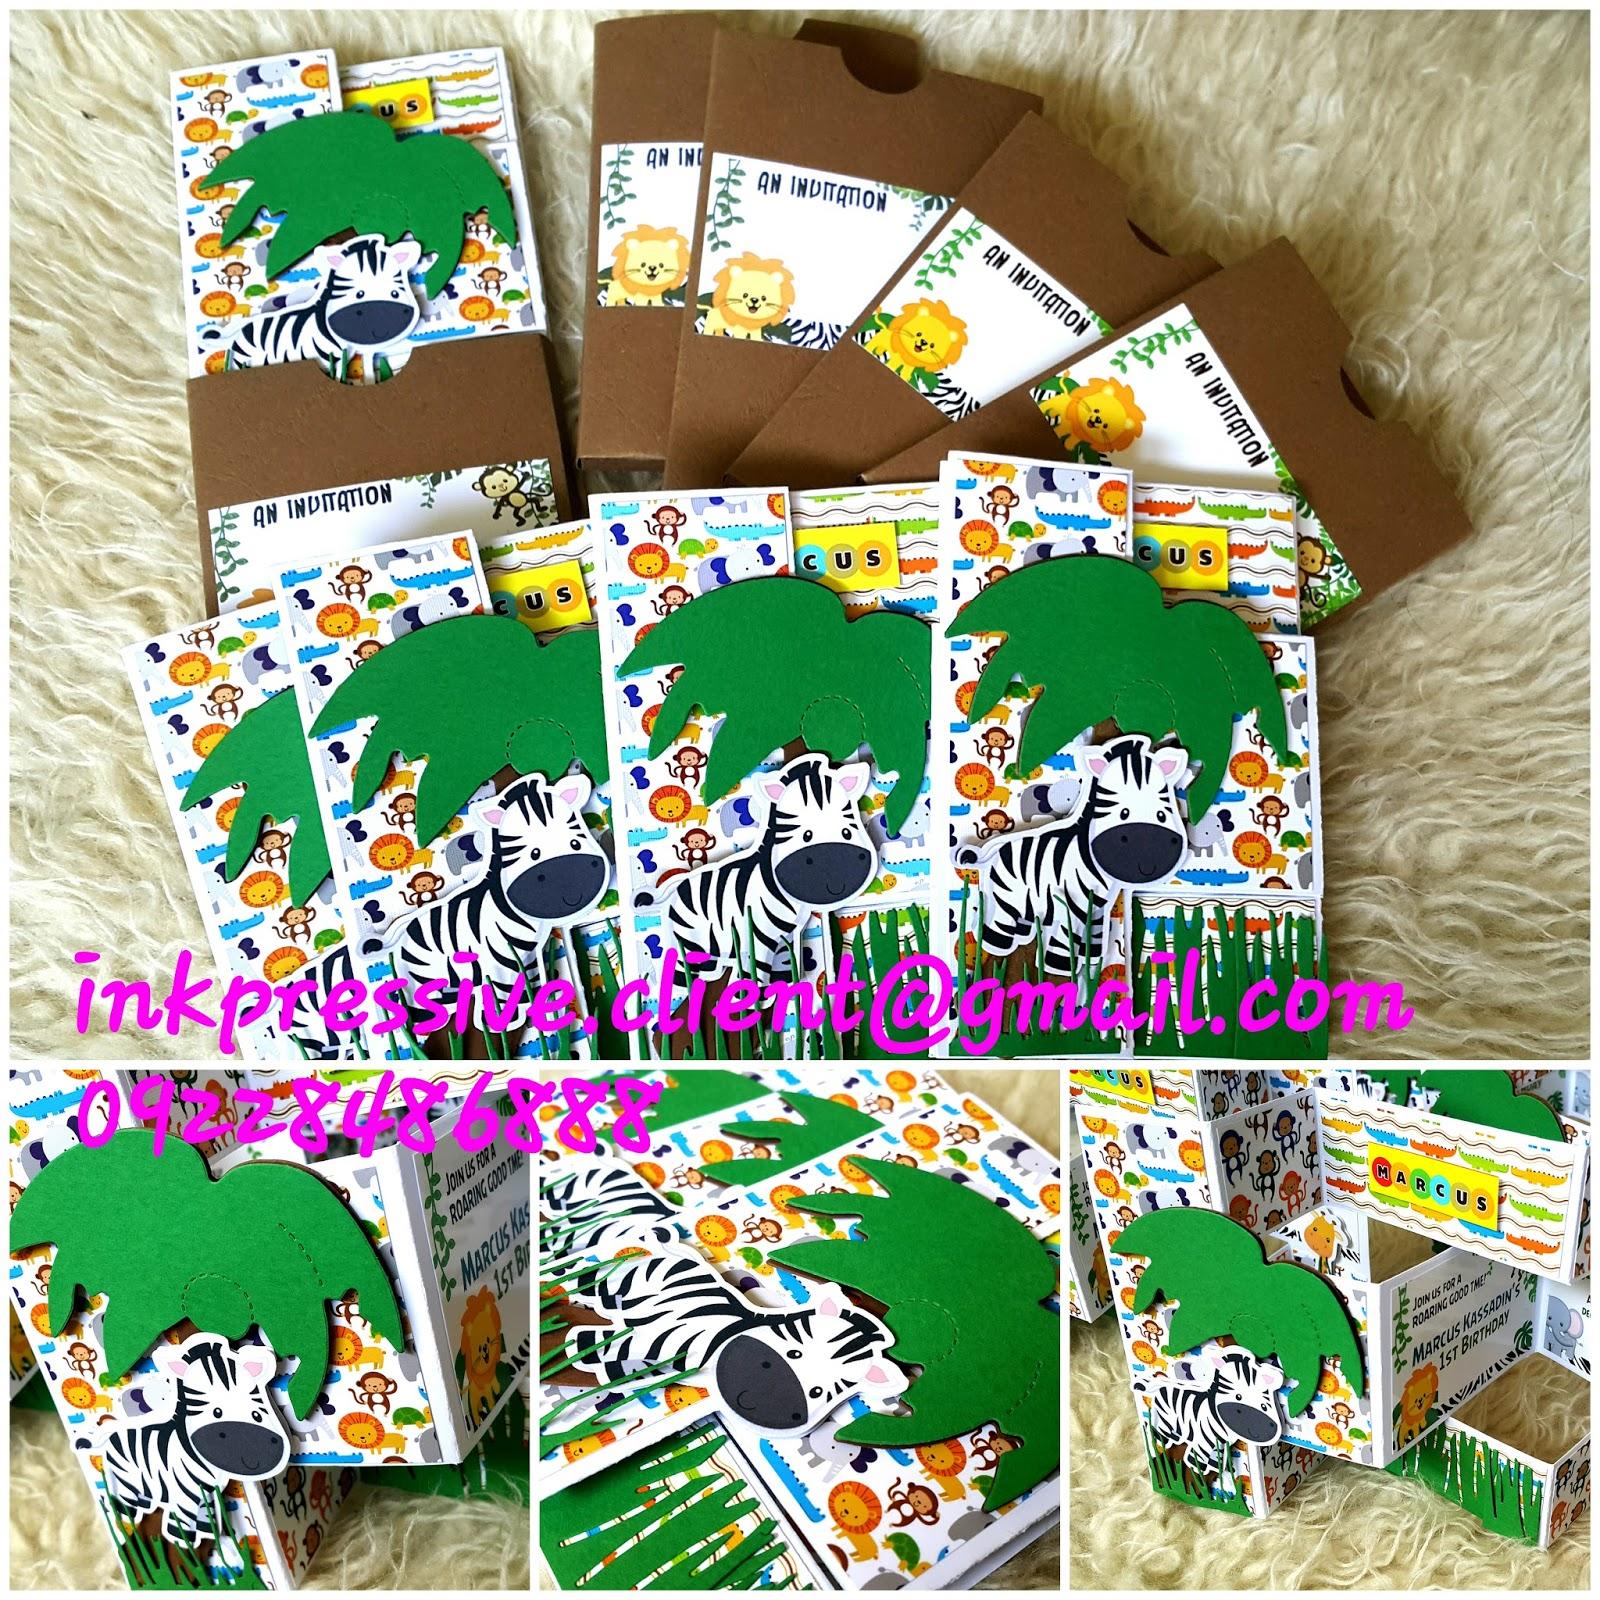 safari themed birthday invitation in trishutter card style kiddie